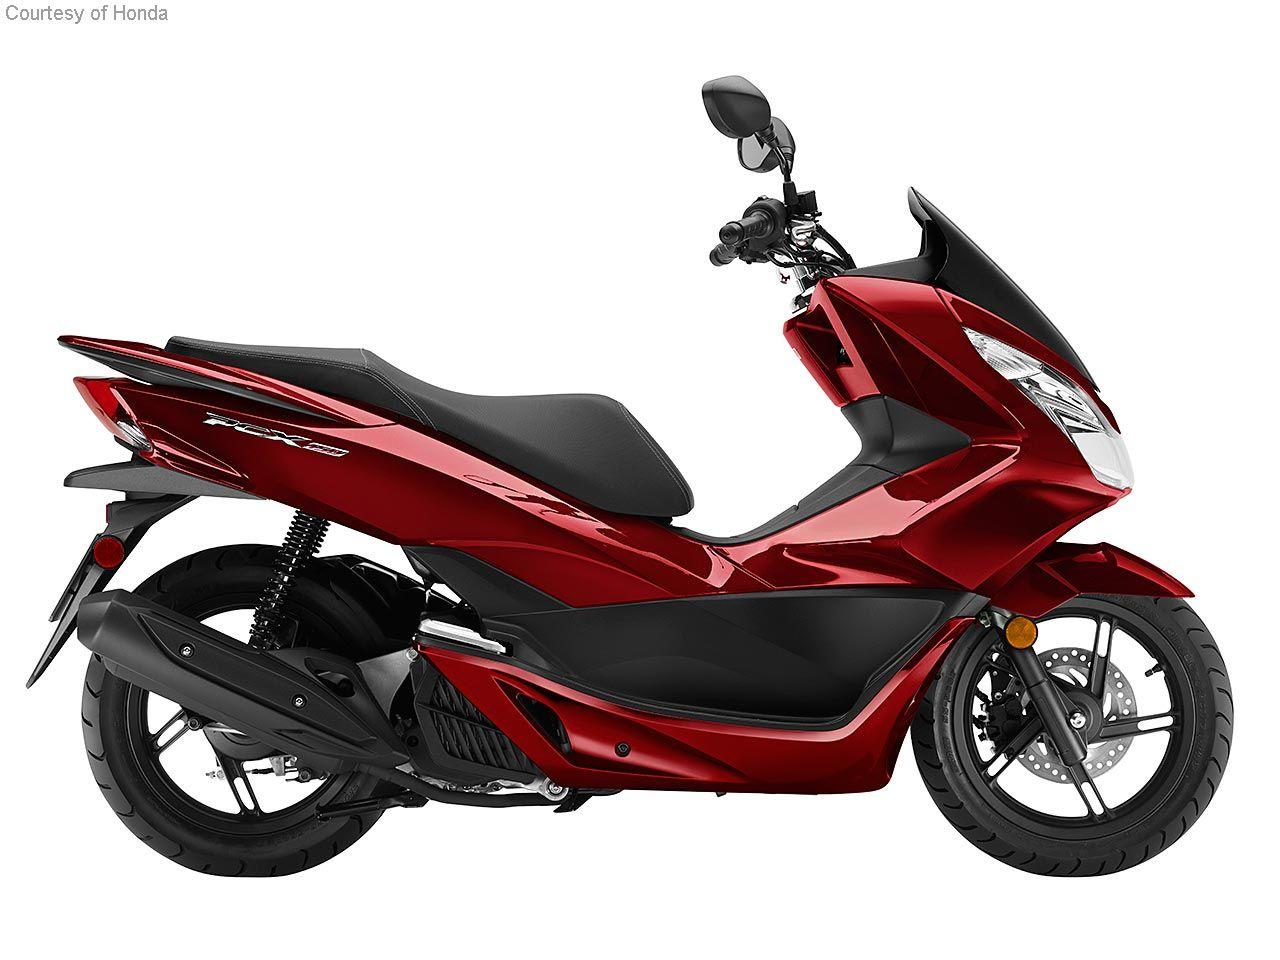 2016 Honda Pcx150 Nm4 First Look Motorcycle Usa